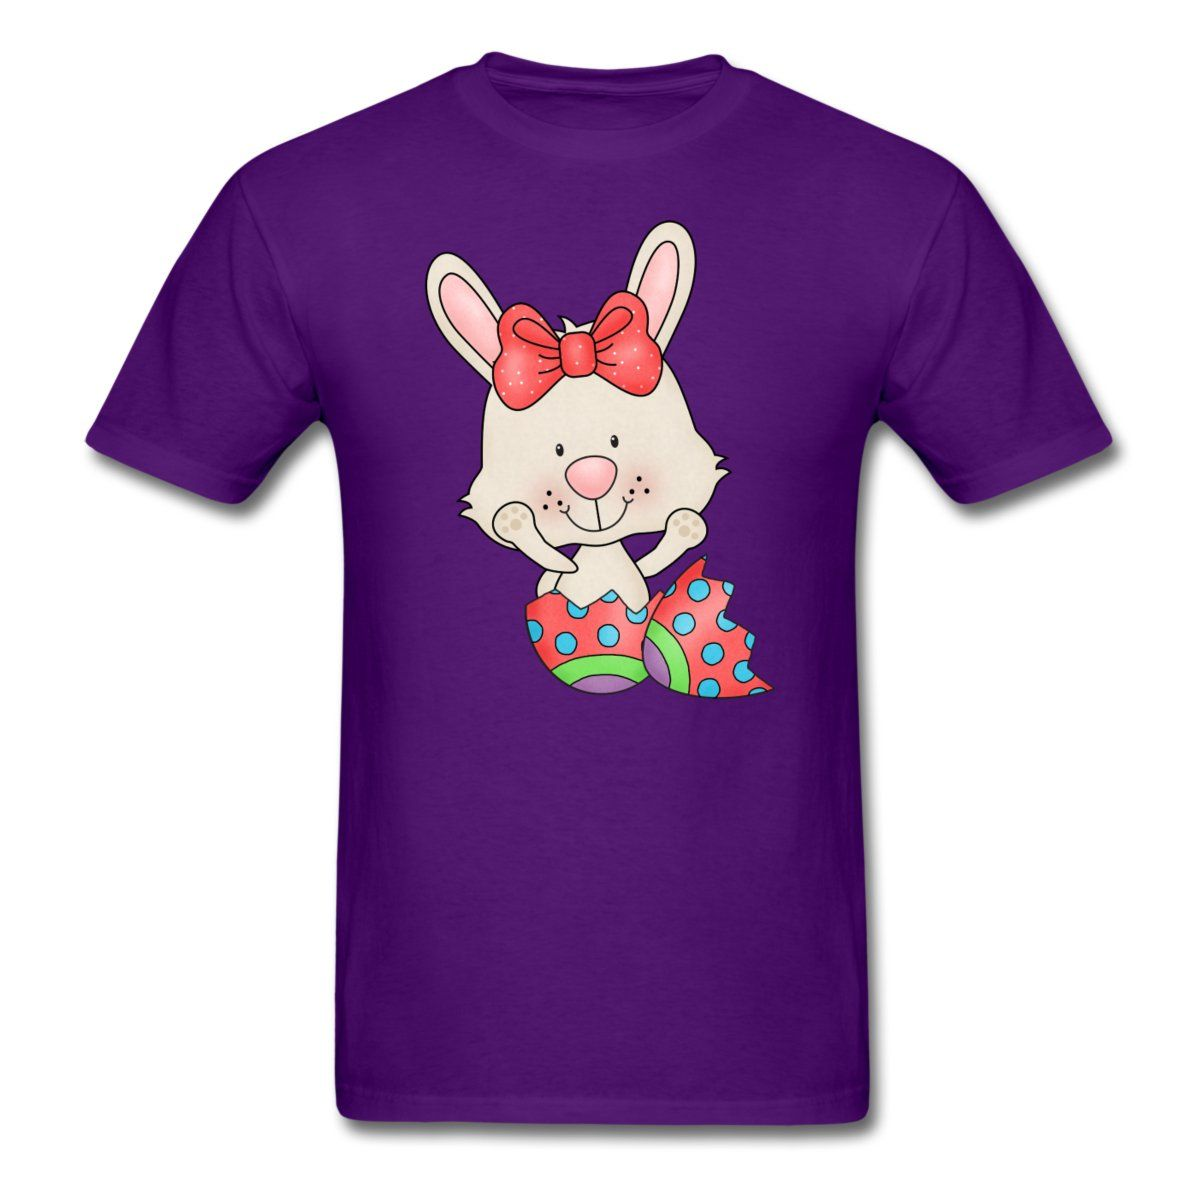 Easter Bunny - Men's T-Shirt